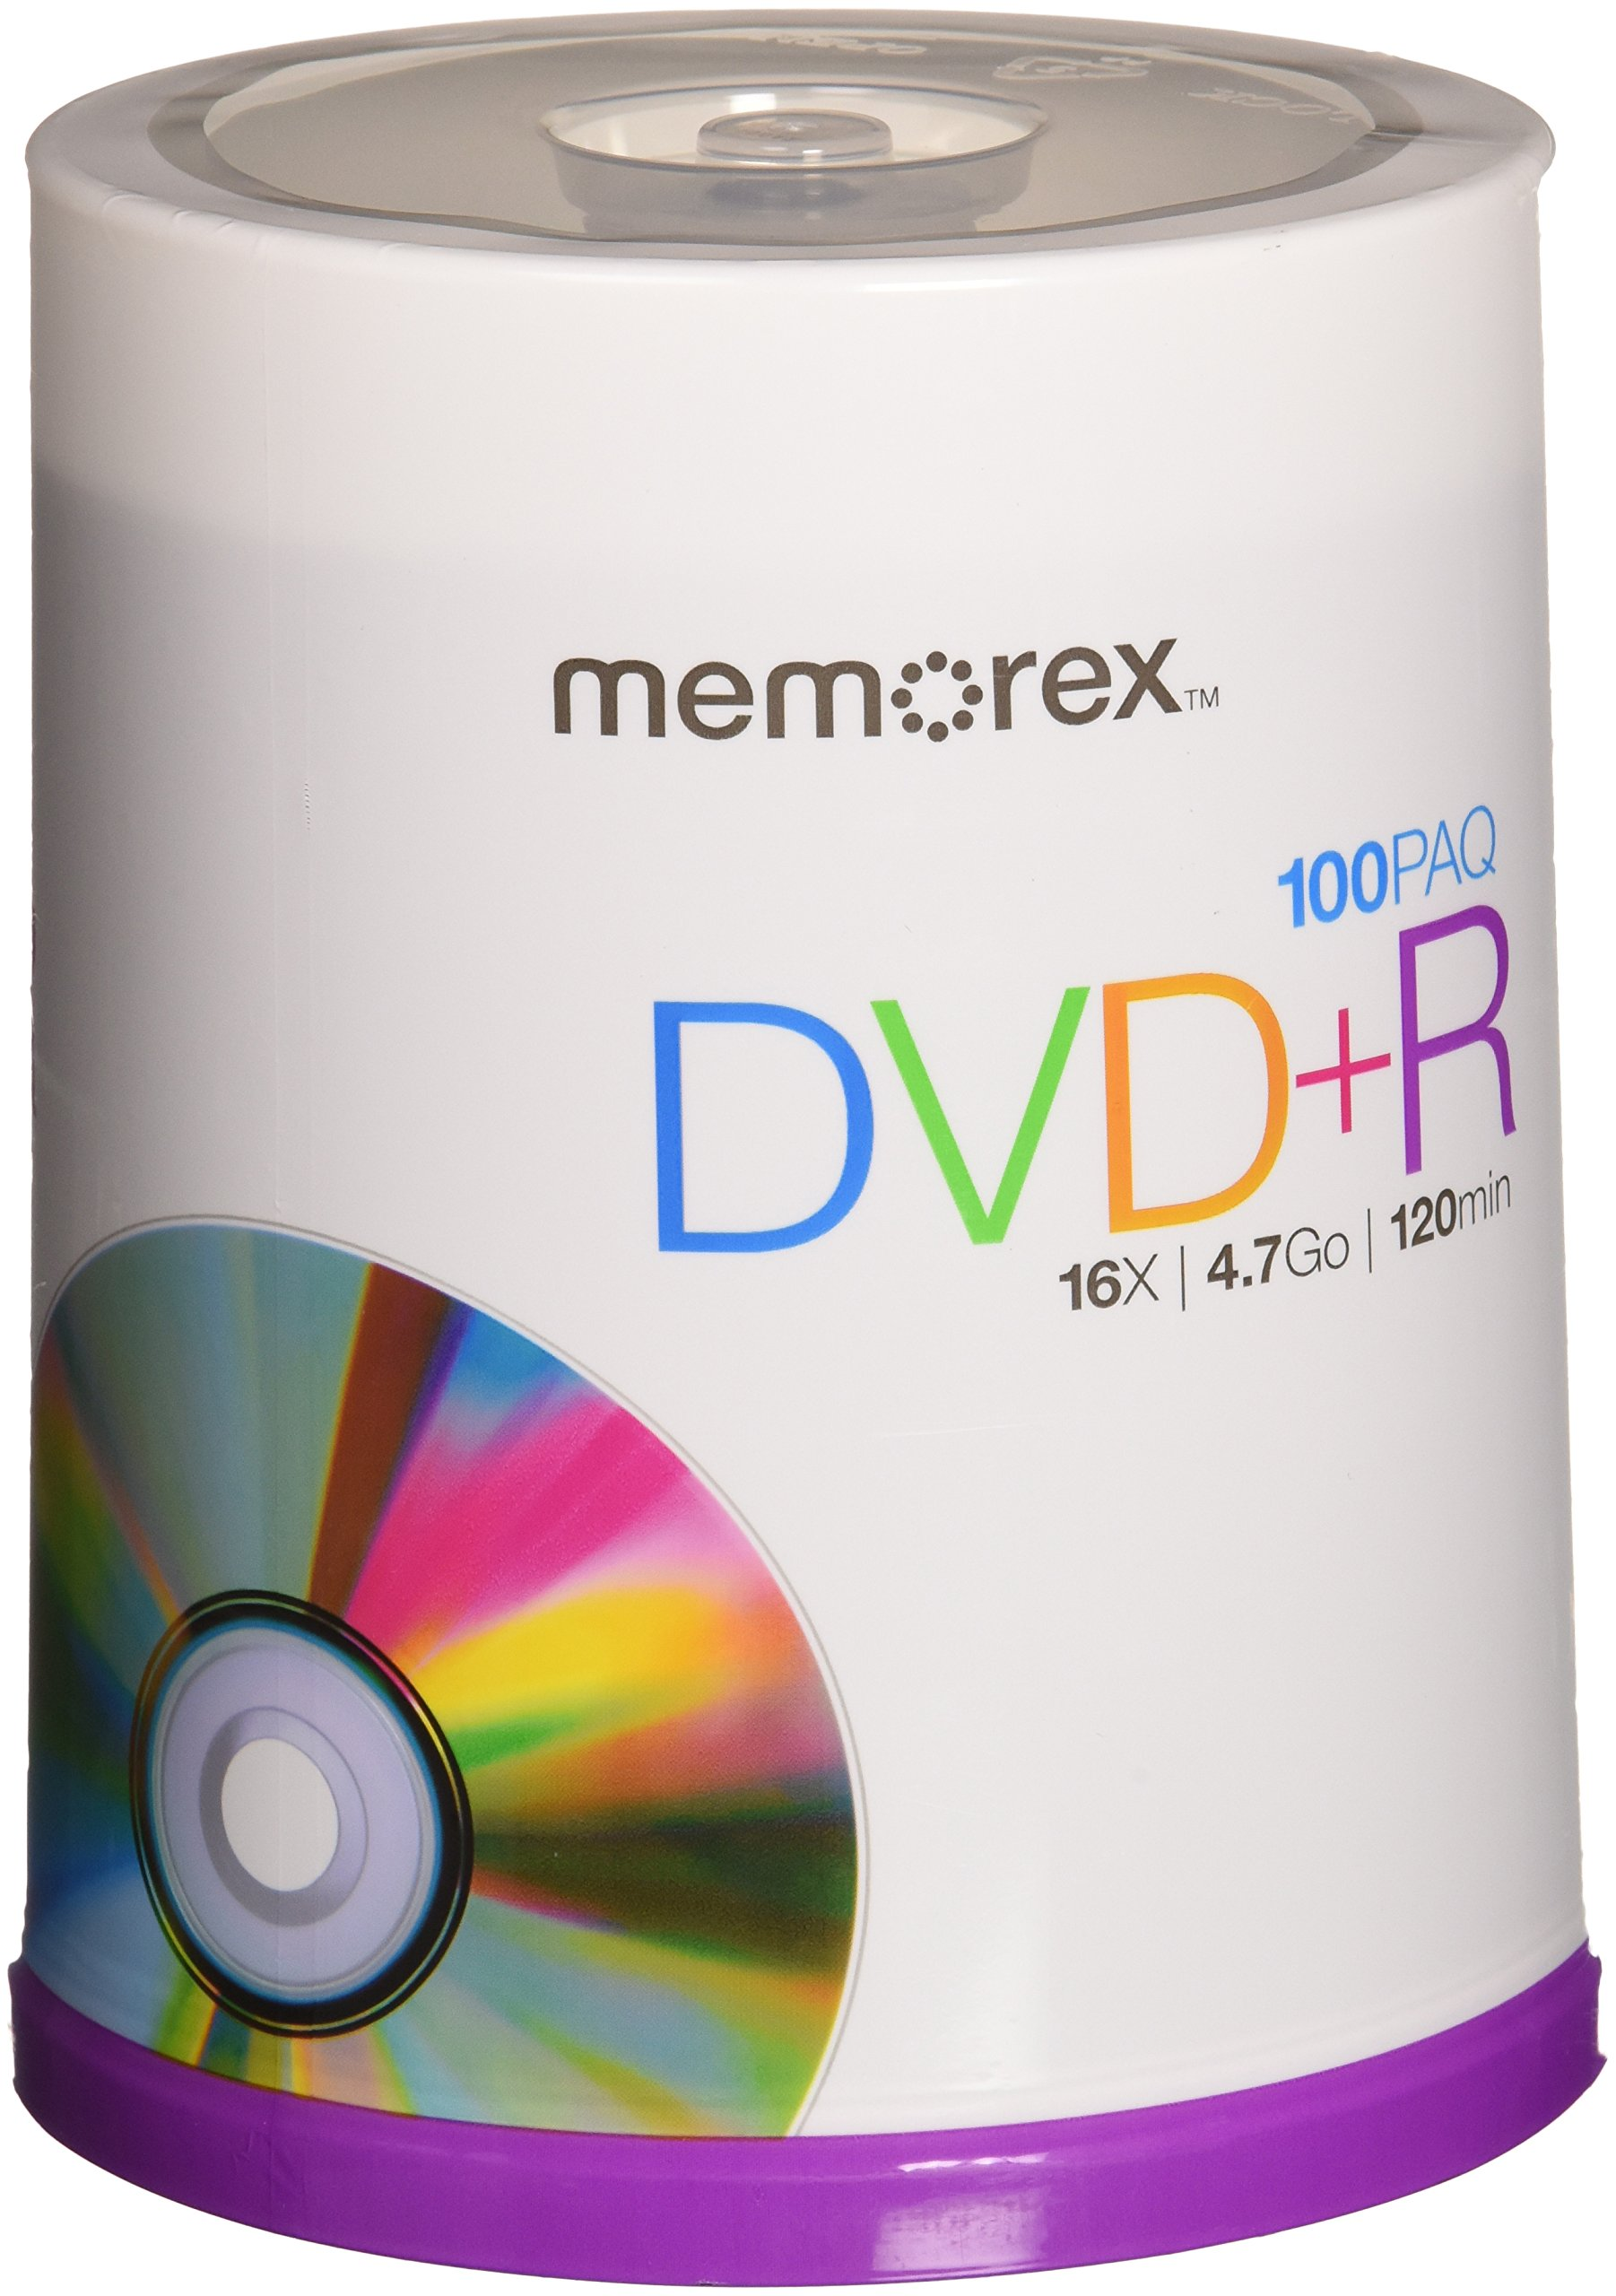 Memorex DVD+R 4.7GB Multipack 2-100 Pack Spindles, 200 discs total